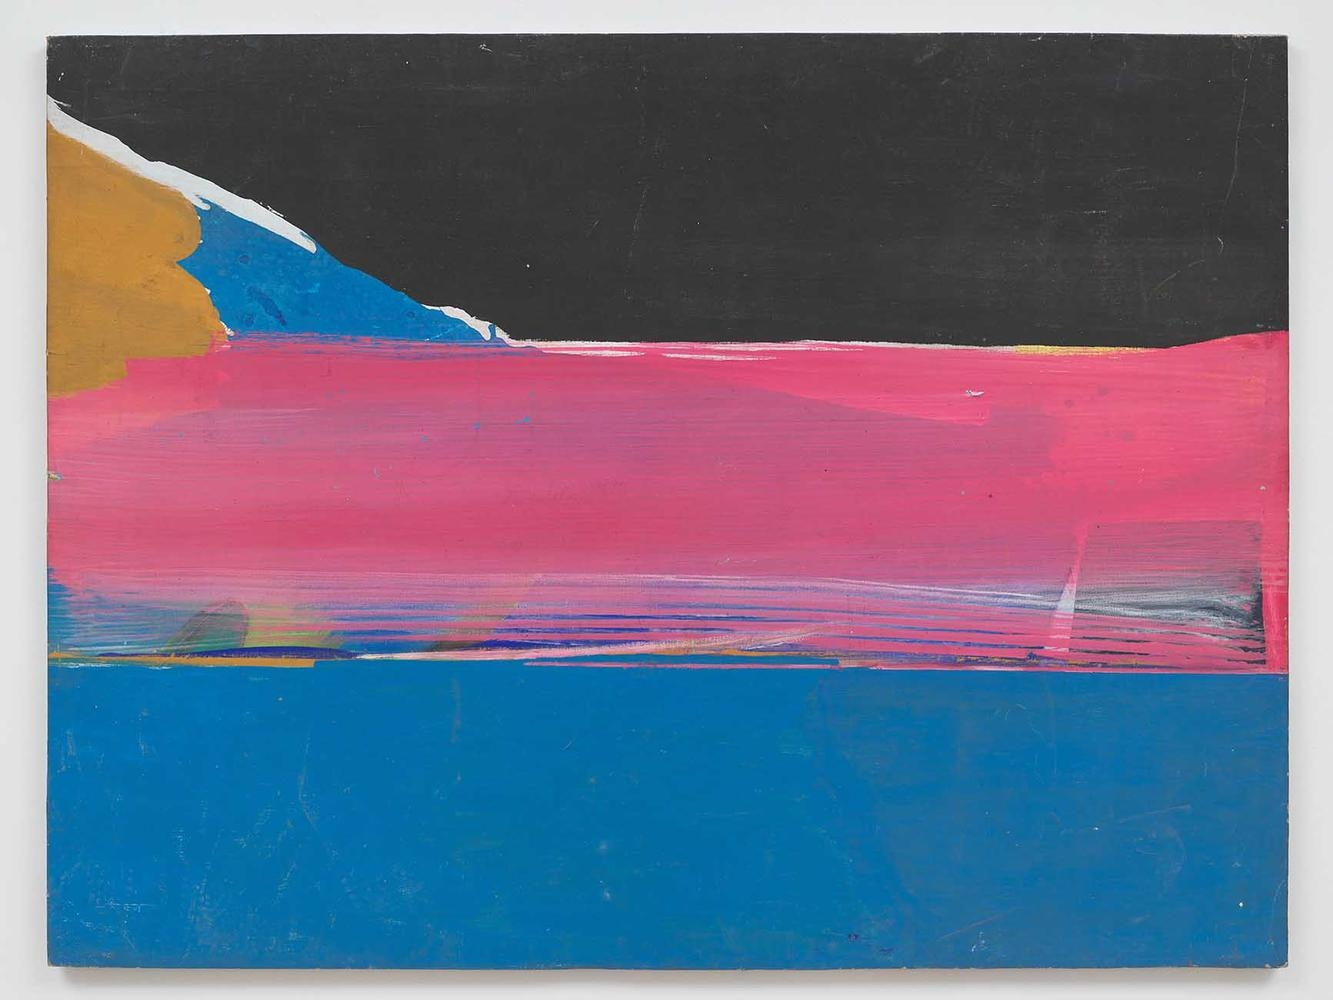 Ed Clark  Flash  1966  acrylic on canvas  44 x 58 1/2 inches (111.8 x 149.2 cm)